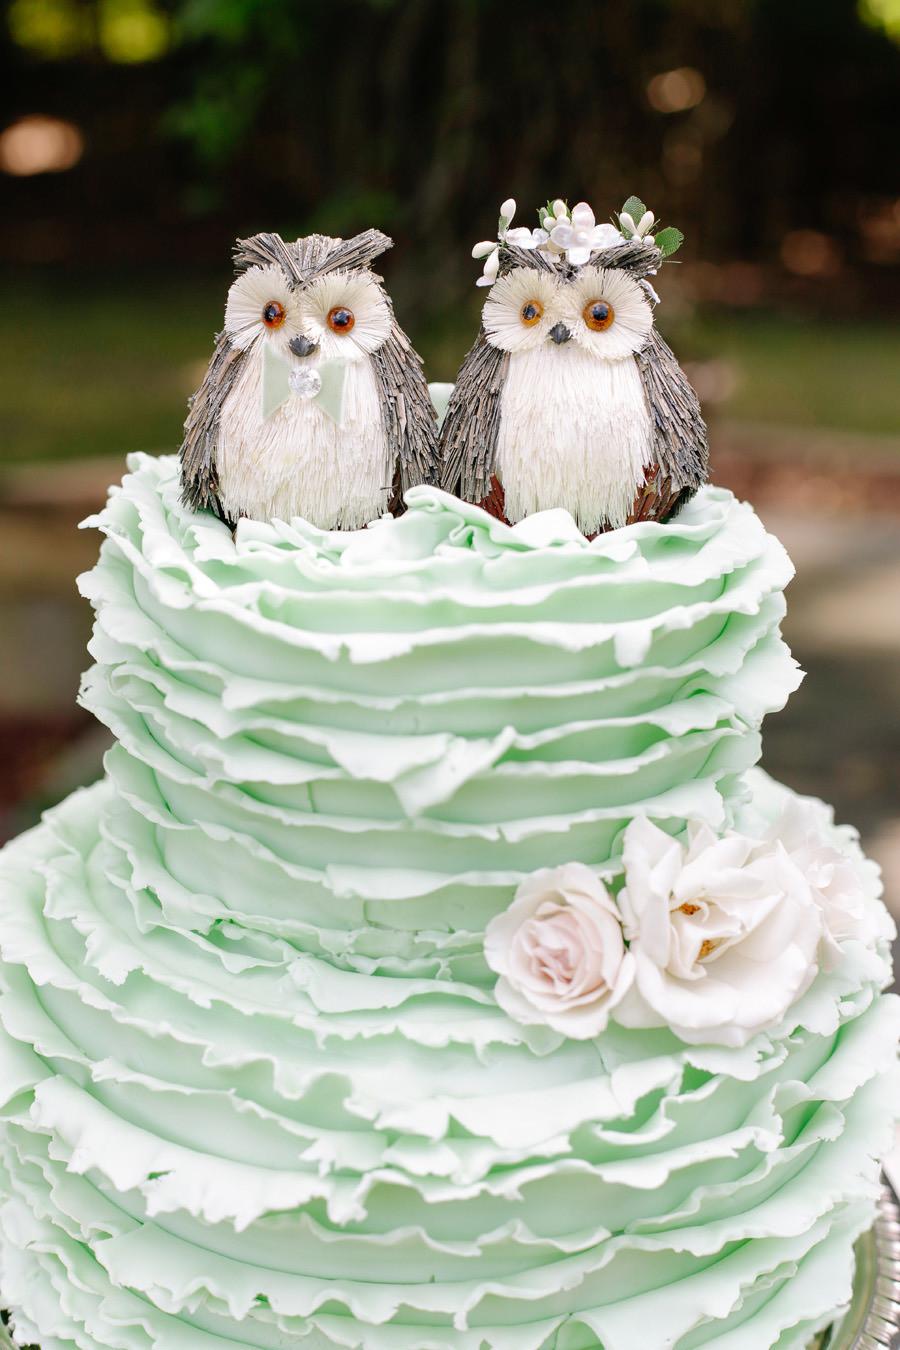 Creative Wedding Cakes  New Creative Wedding Cake Ideas MODwedding